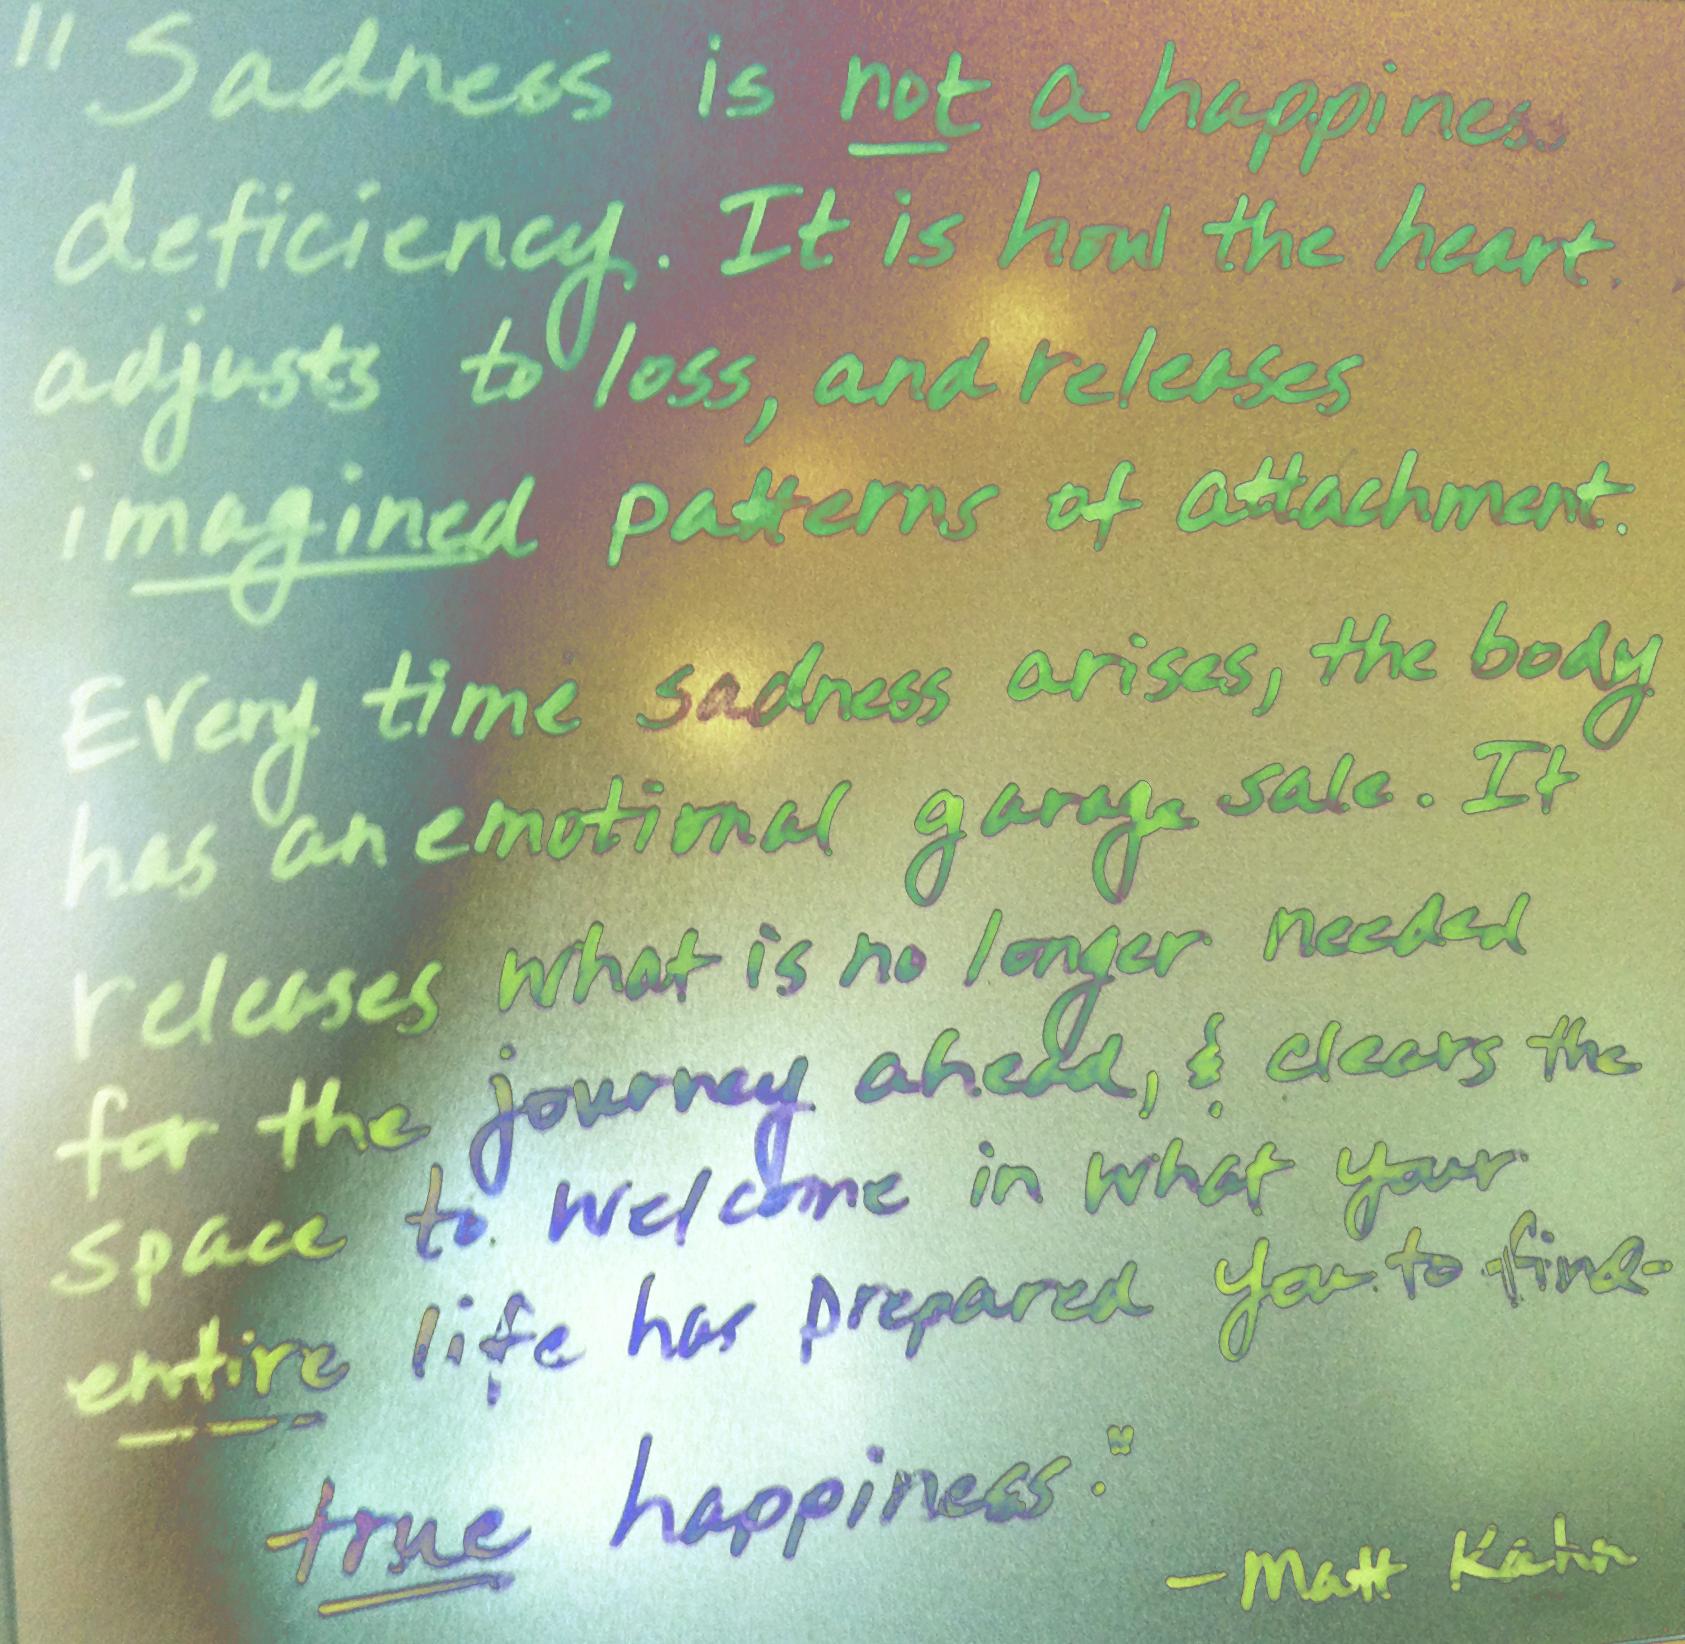 Matt Kahn Quotes | Truehappiness Mattkahnquote Rachel S Workshop